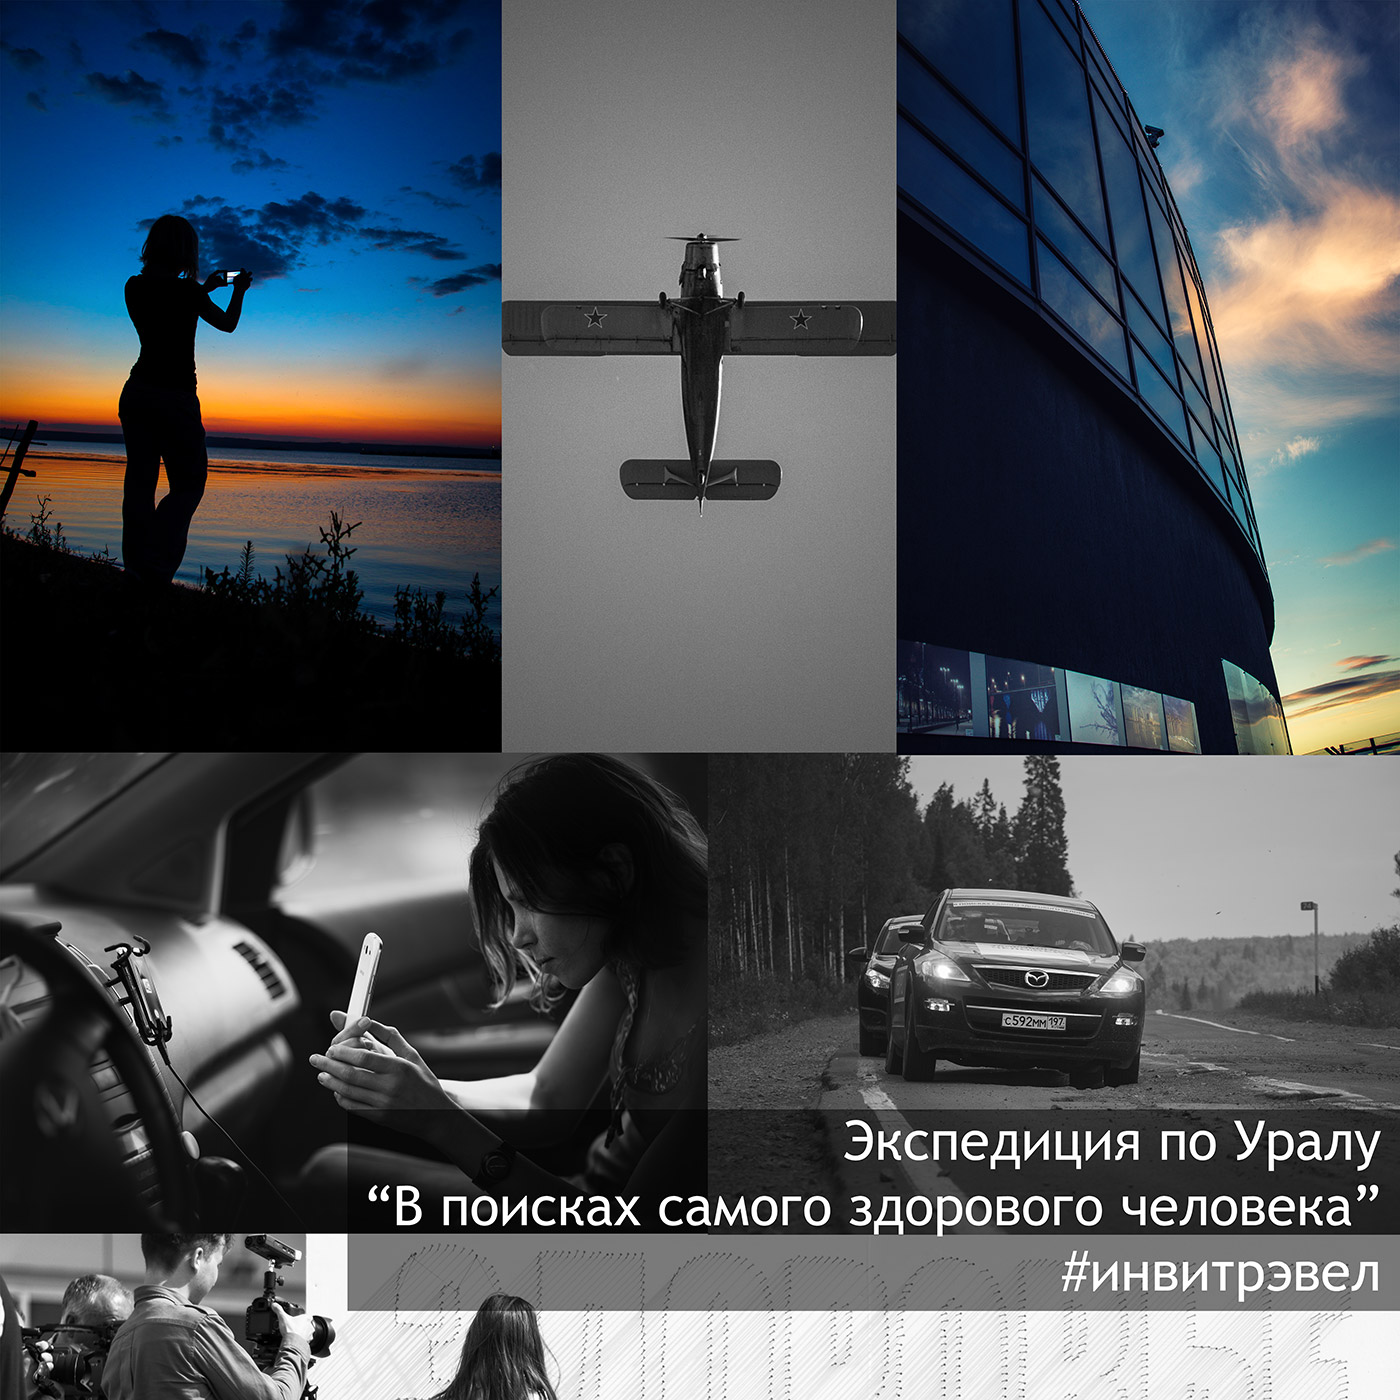 Экспедиция Инвитро по Уралу - #инвитрэвел